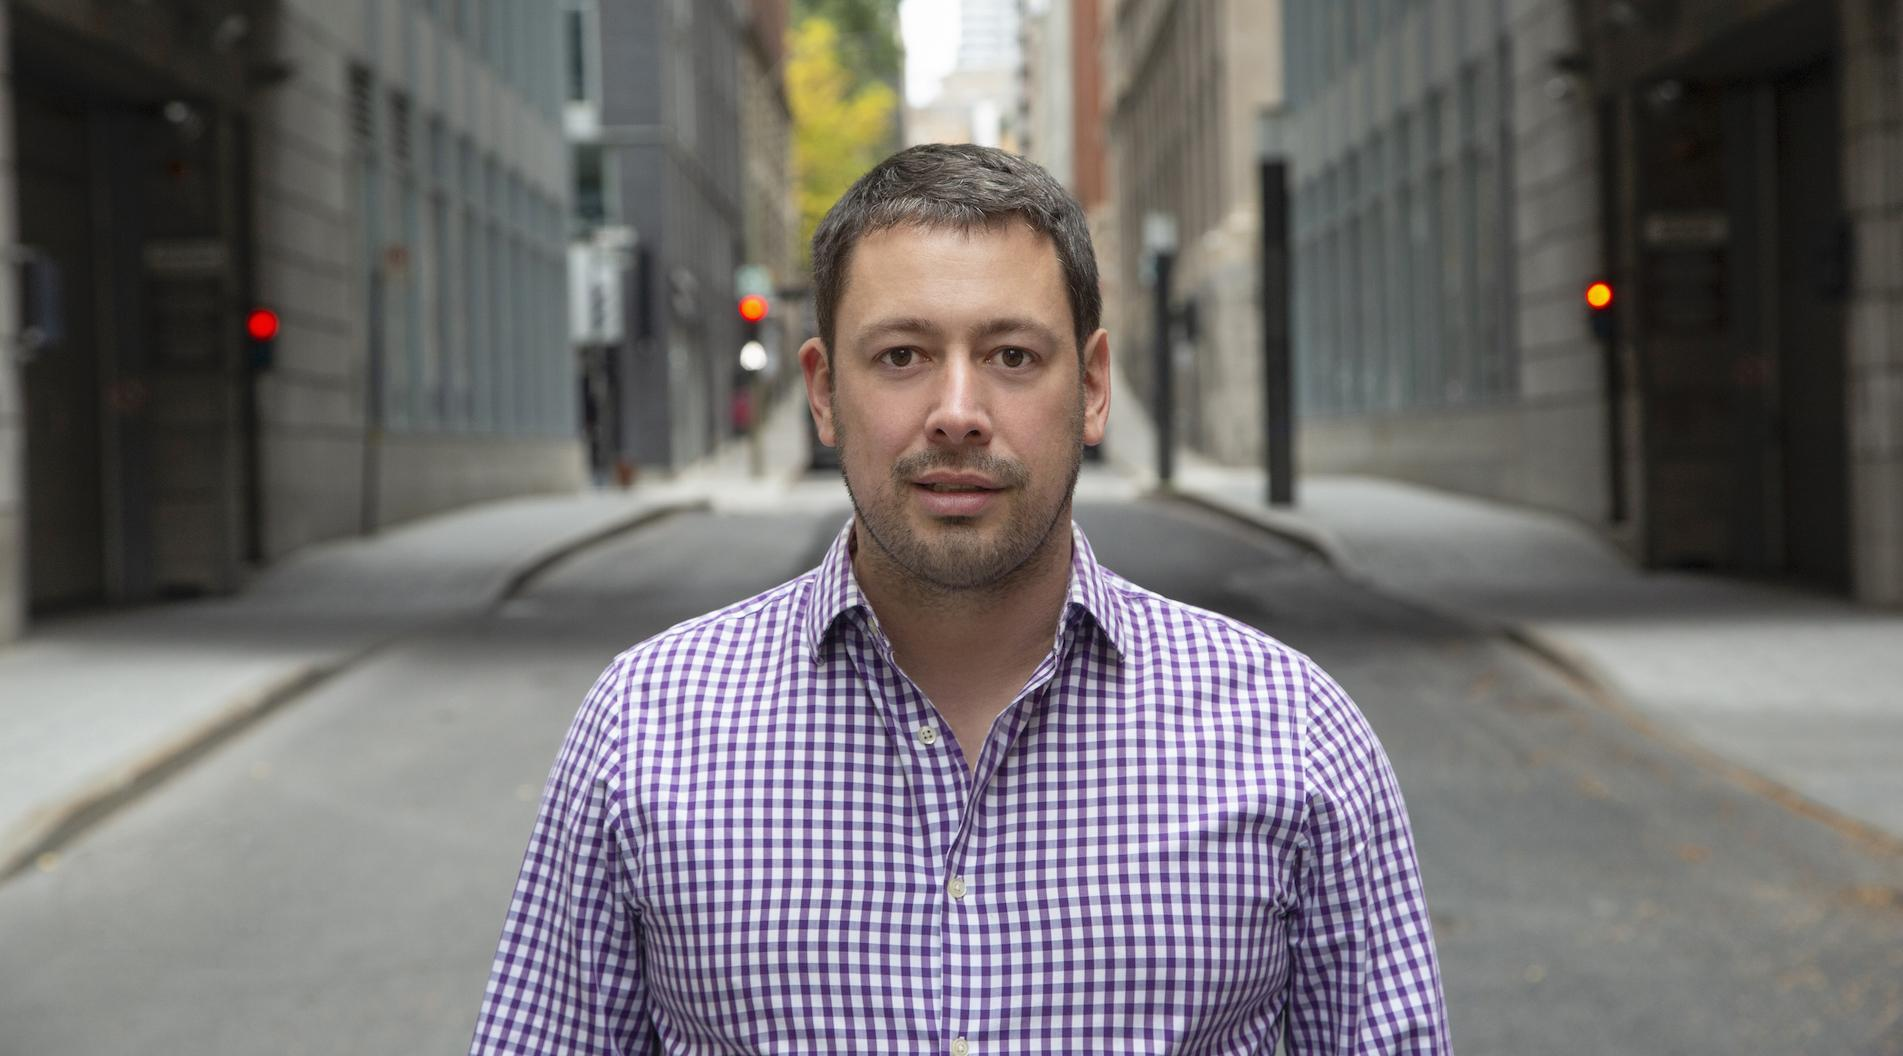 Étienne Garbugli – Entrepreneur & Author of Lean B2B